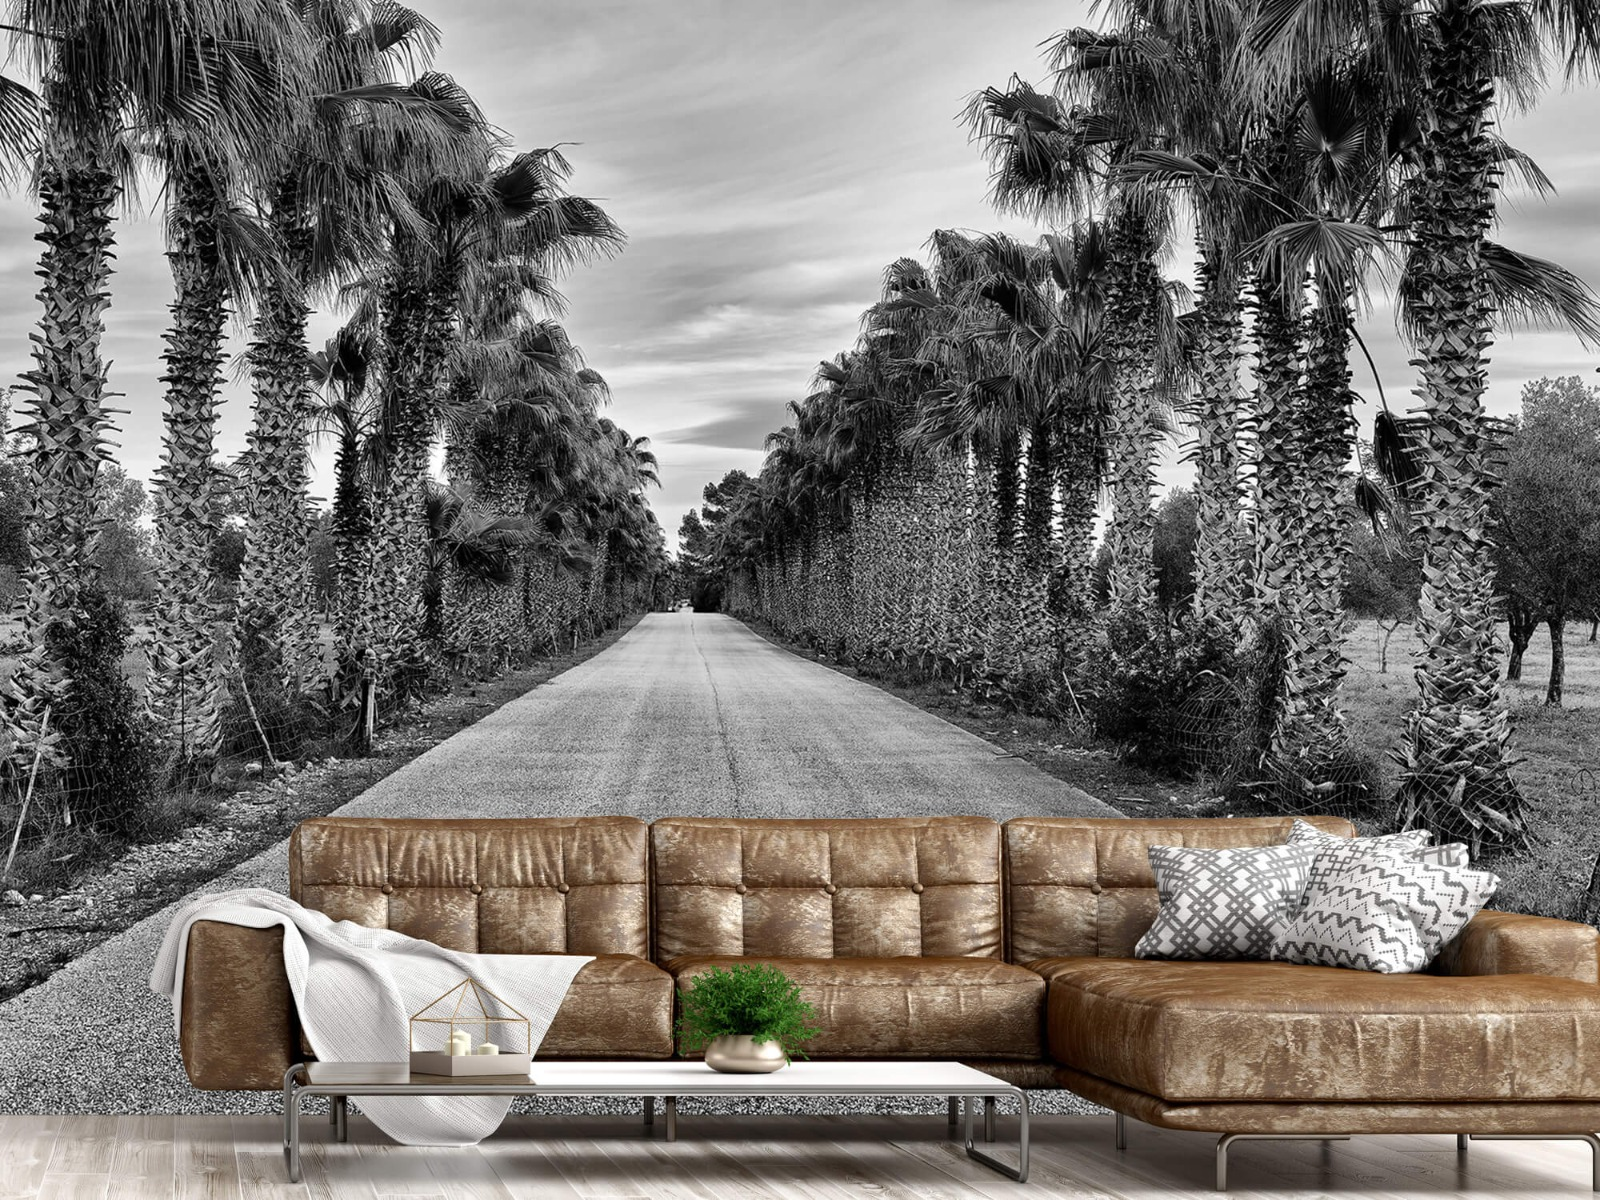 Palmbomen - Straat met palmbomen - Woonkamer 14